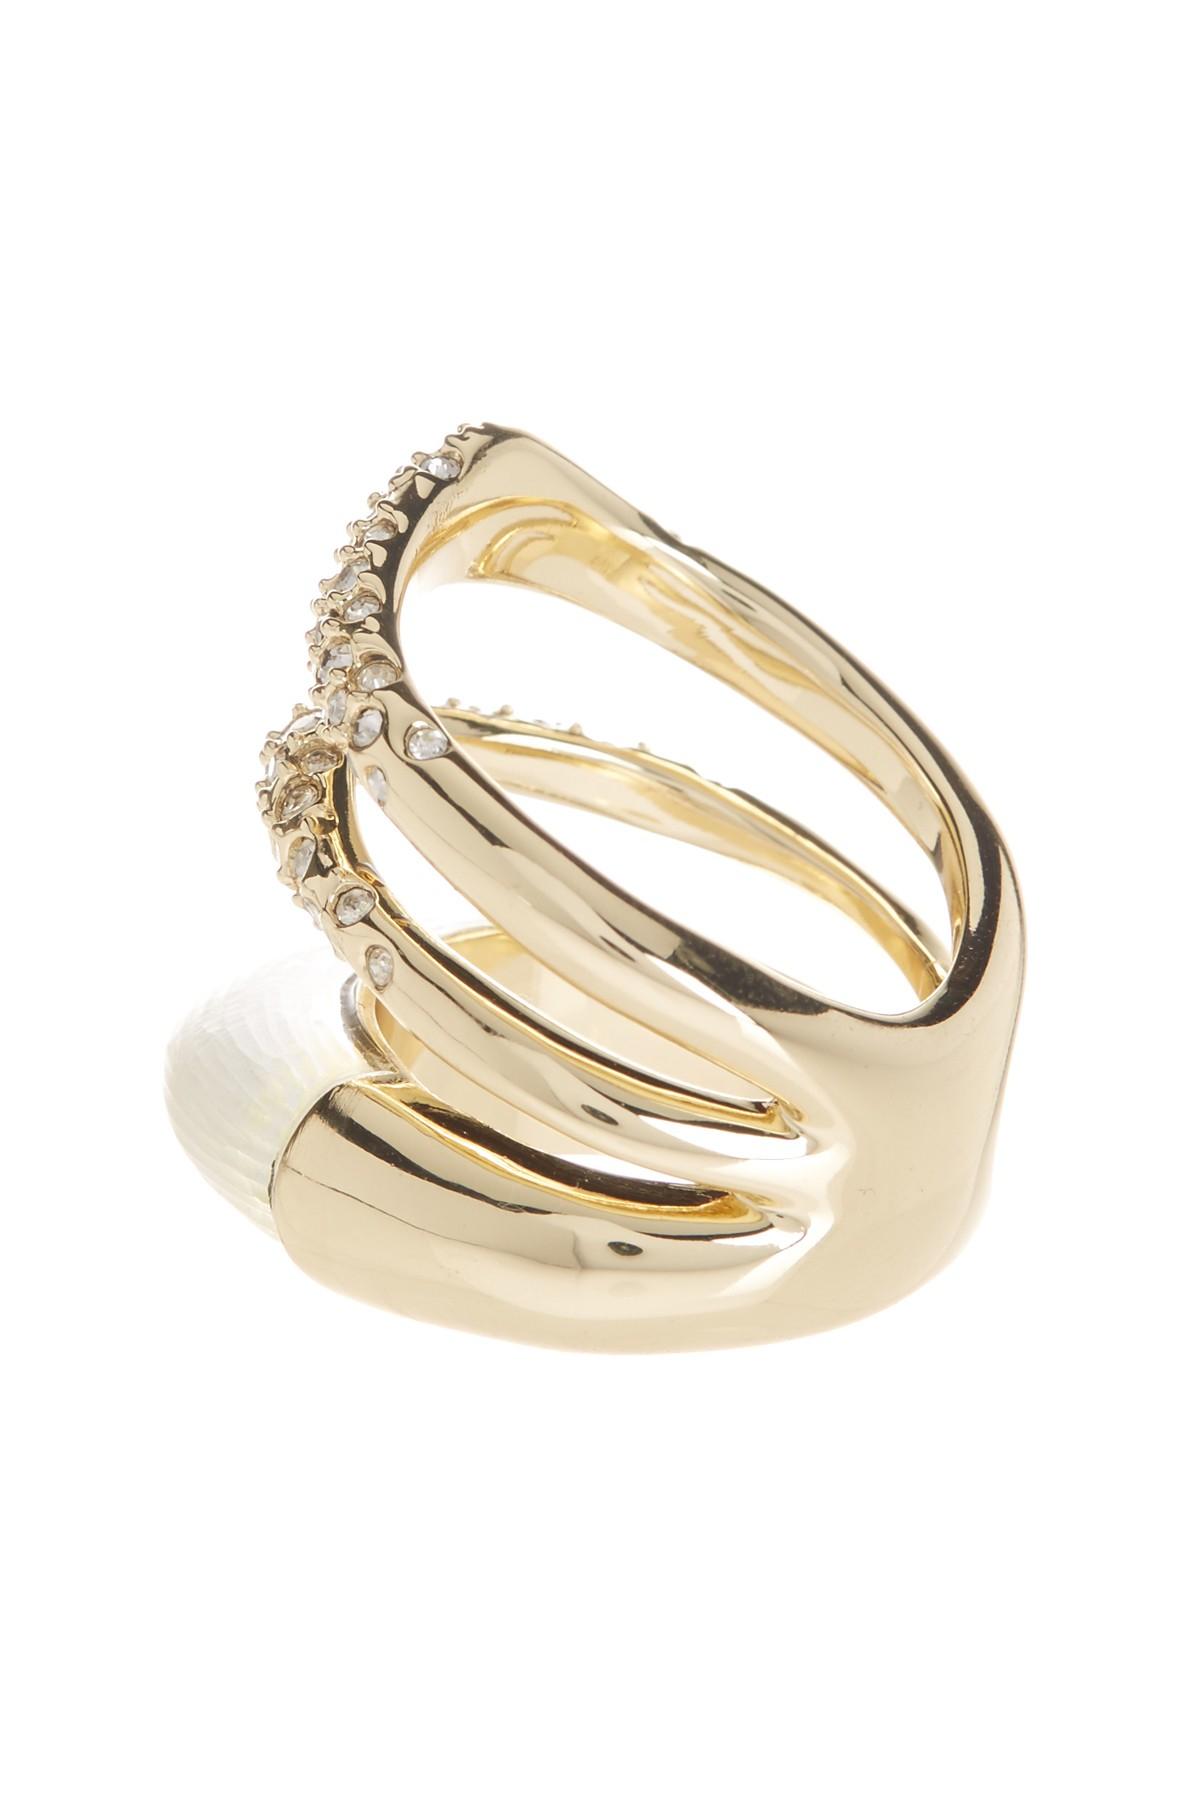 Lyst Alexis Bittar Lucite Crystal Encrusted Orbital Ring